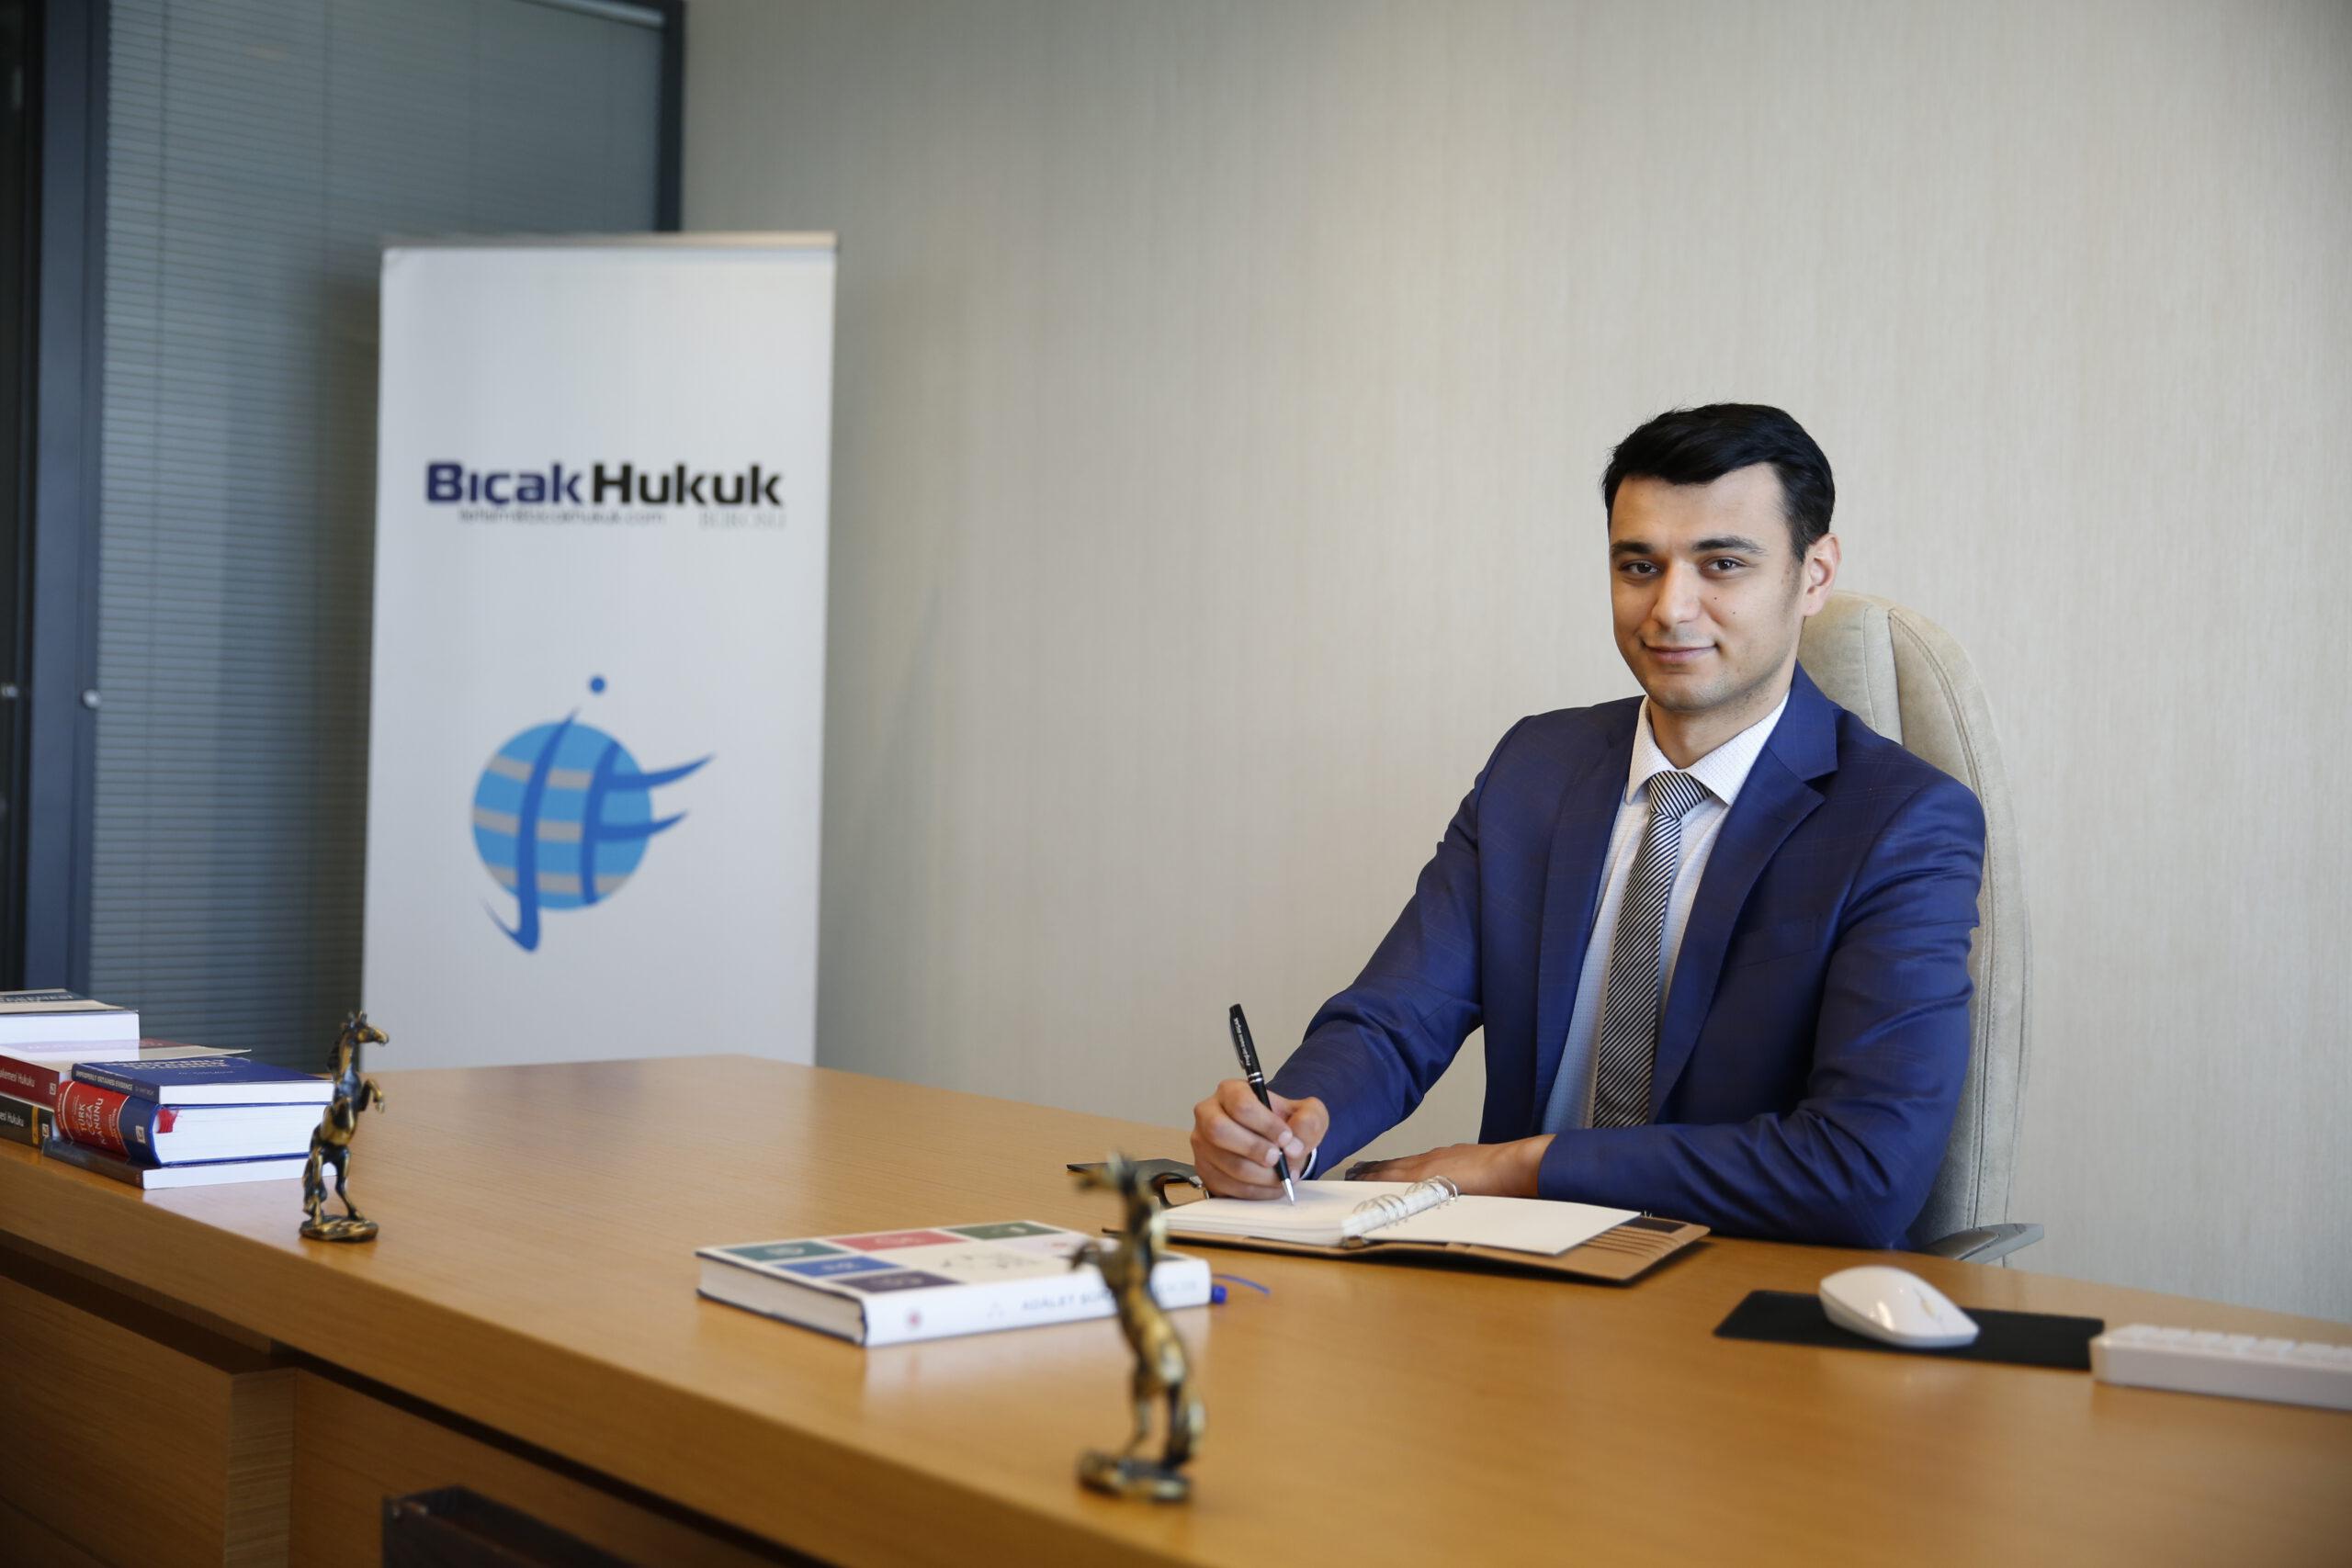 Avukat Vahdet Talha Bıçak, Deniz Hukuku, Finans Hukuku, Ankara Avukat, Bıçak Hukuk